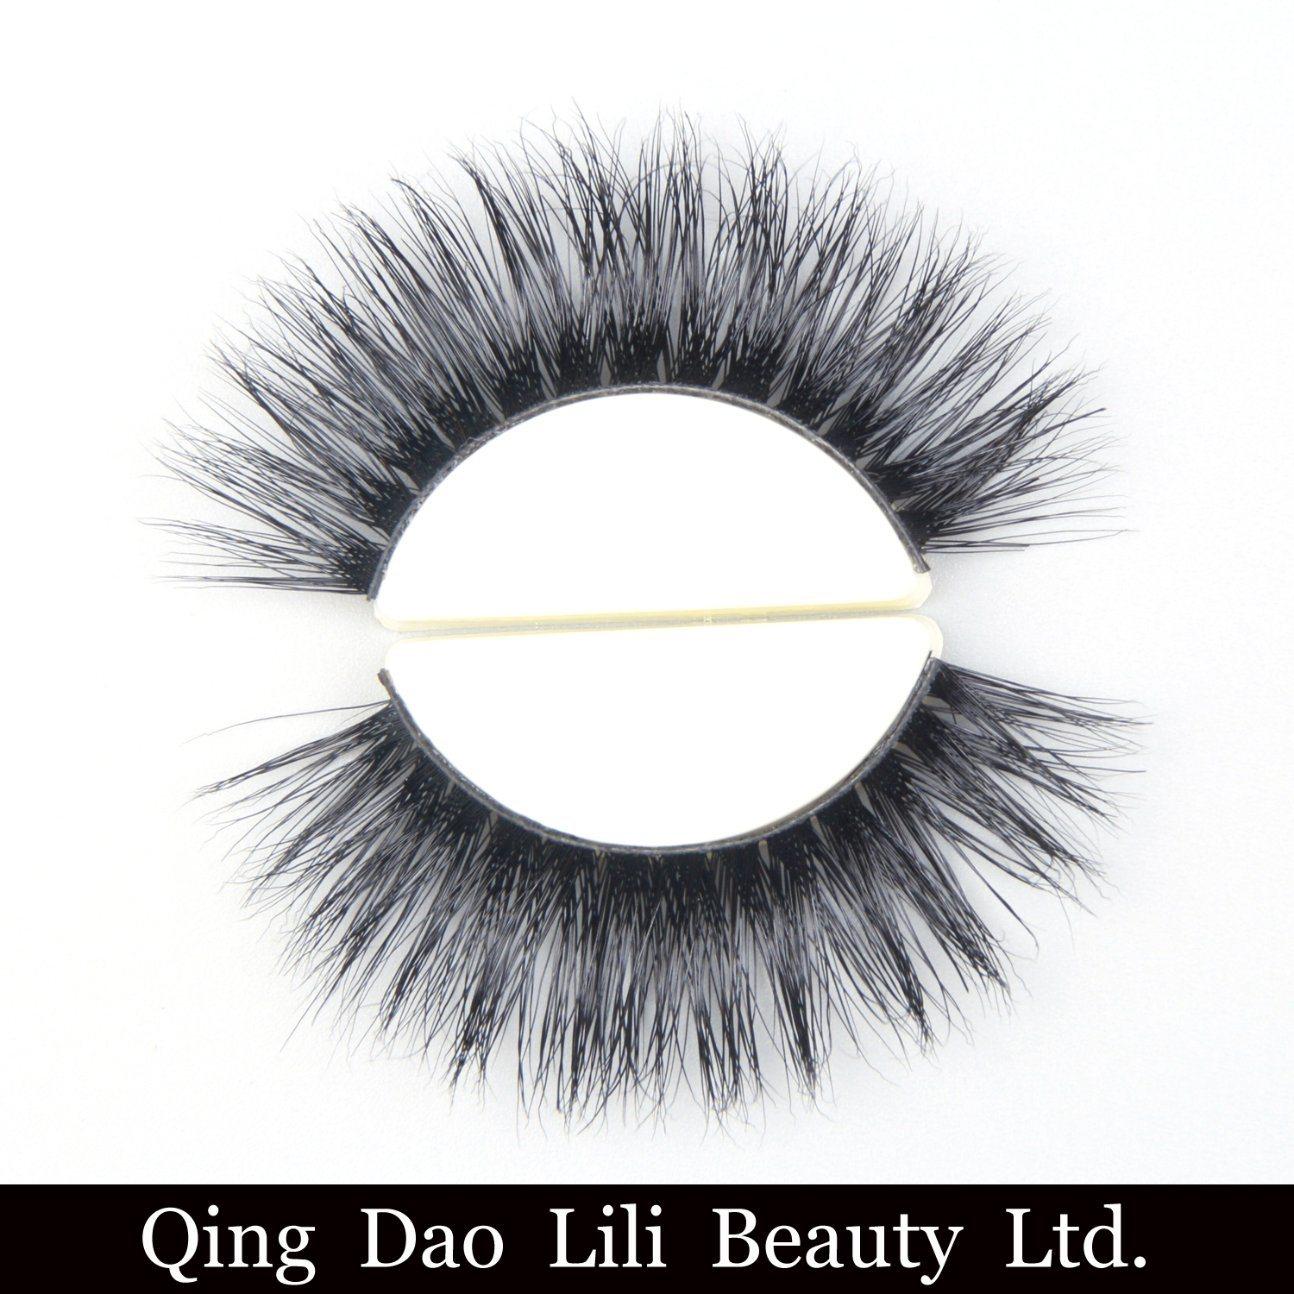 China Free Samples 3d Mink Fake Eyelashes Natural False Eyelashes